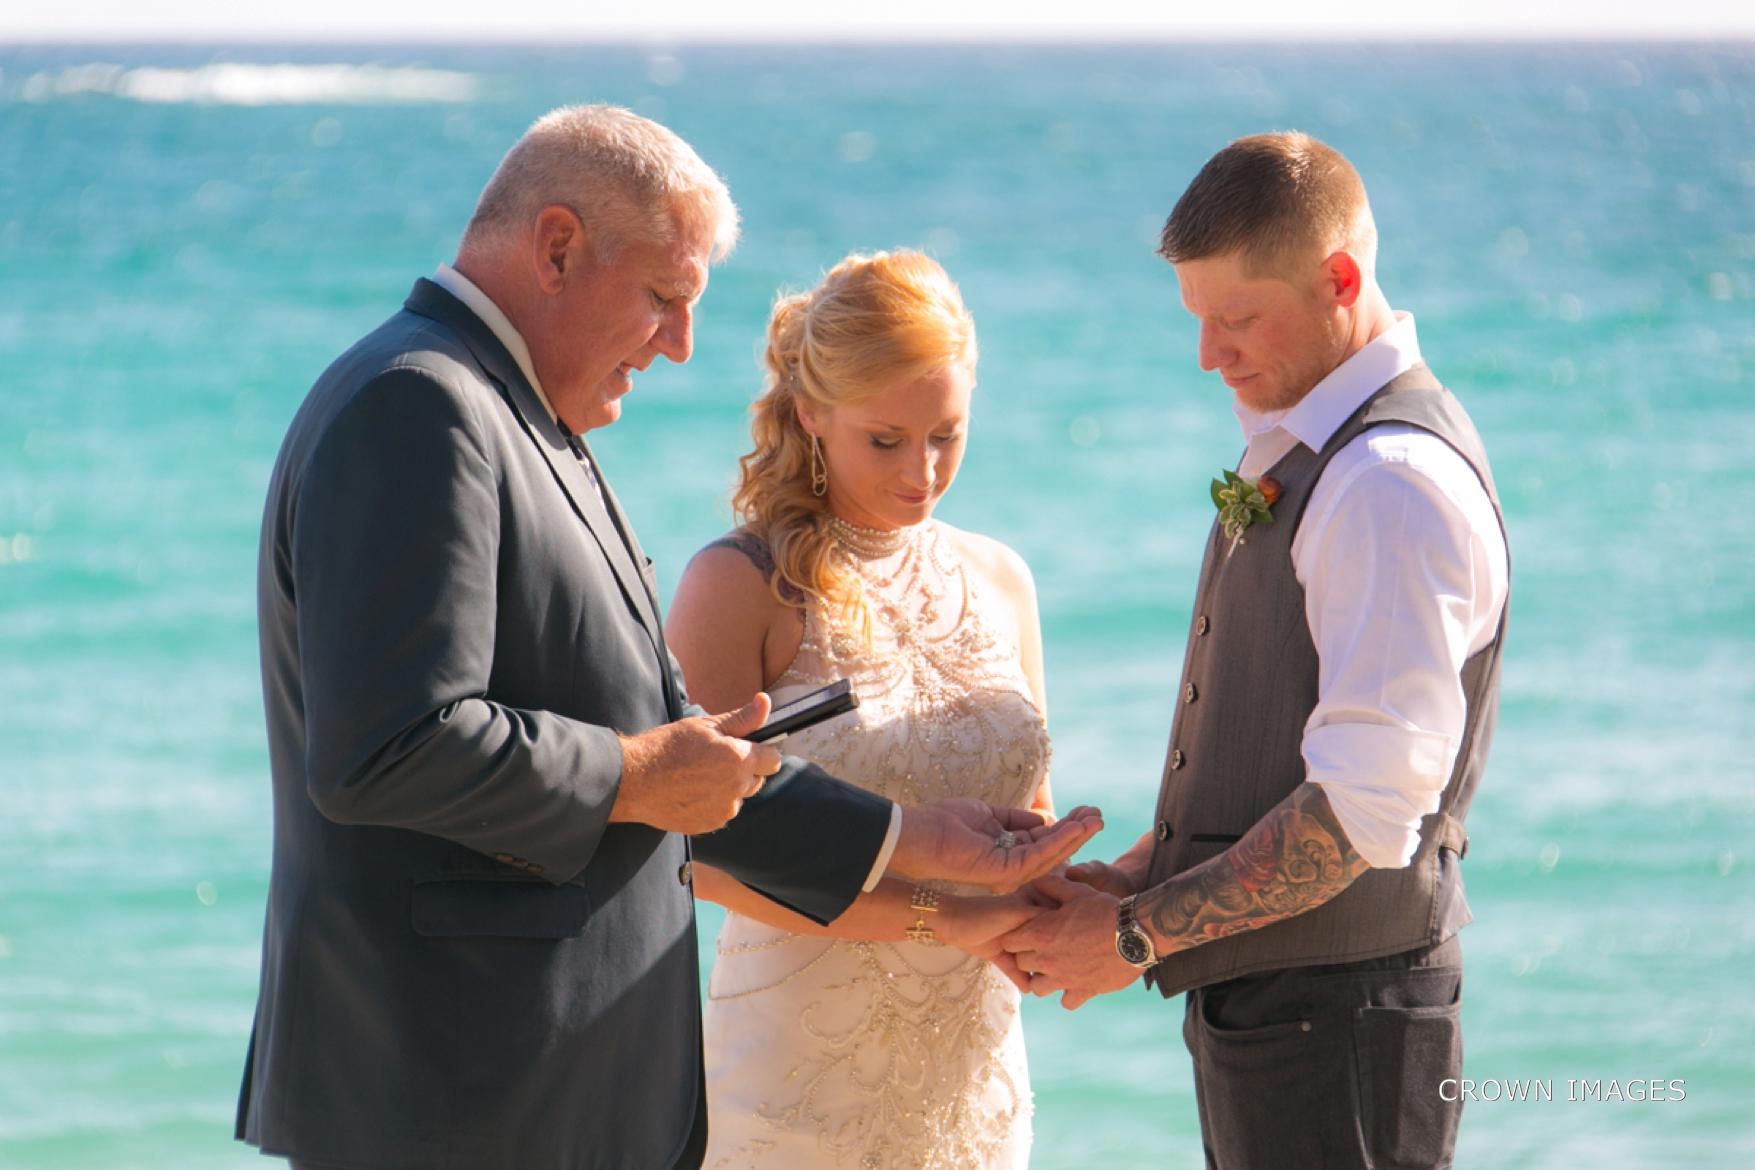 wedding_photos_saint_thomas_crown_images_0604.jpg